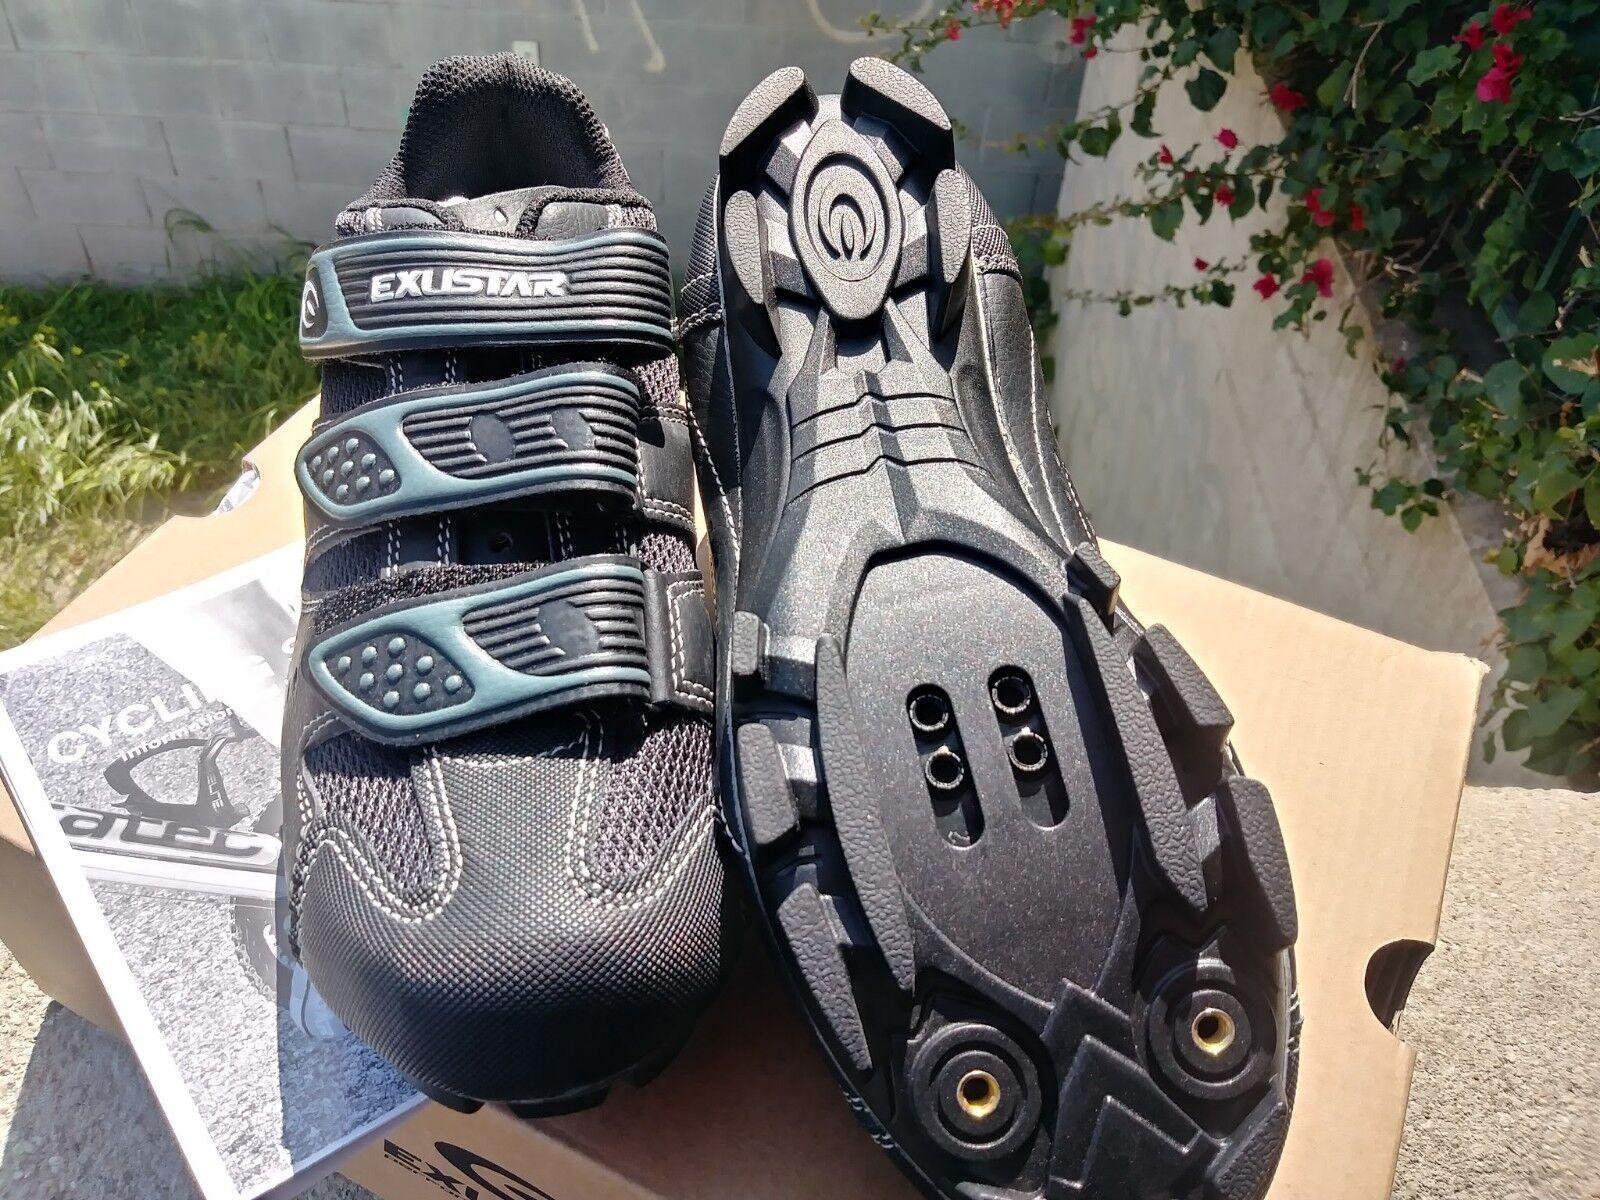 SM324 MTB Cycling Shoe Size 38 Euro 5.5